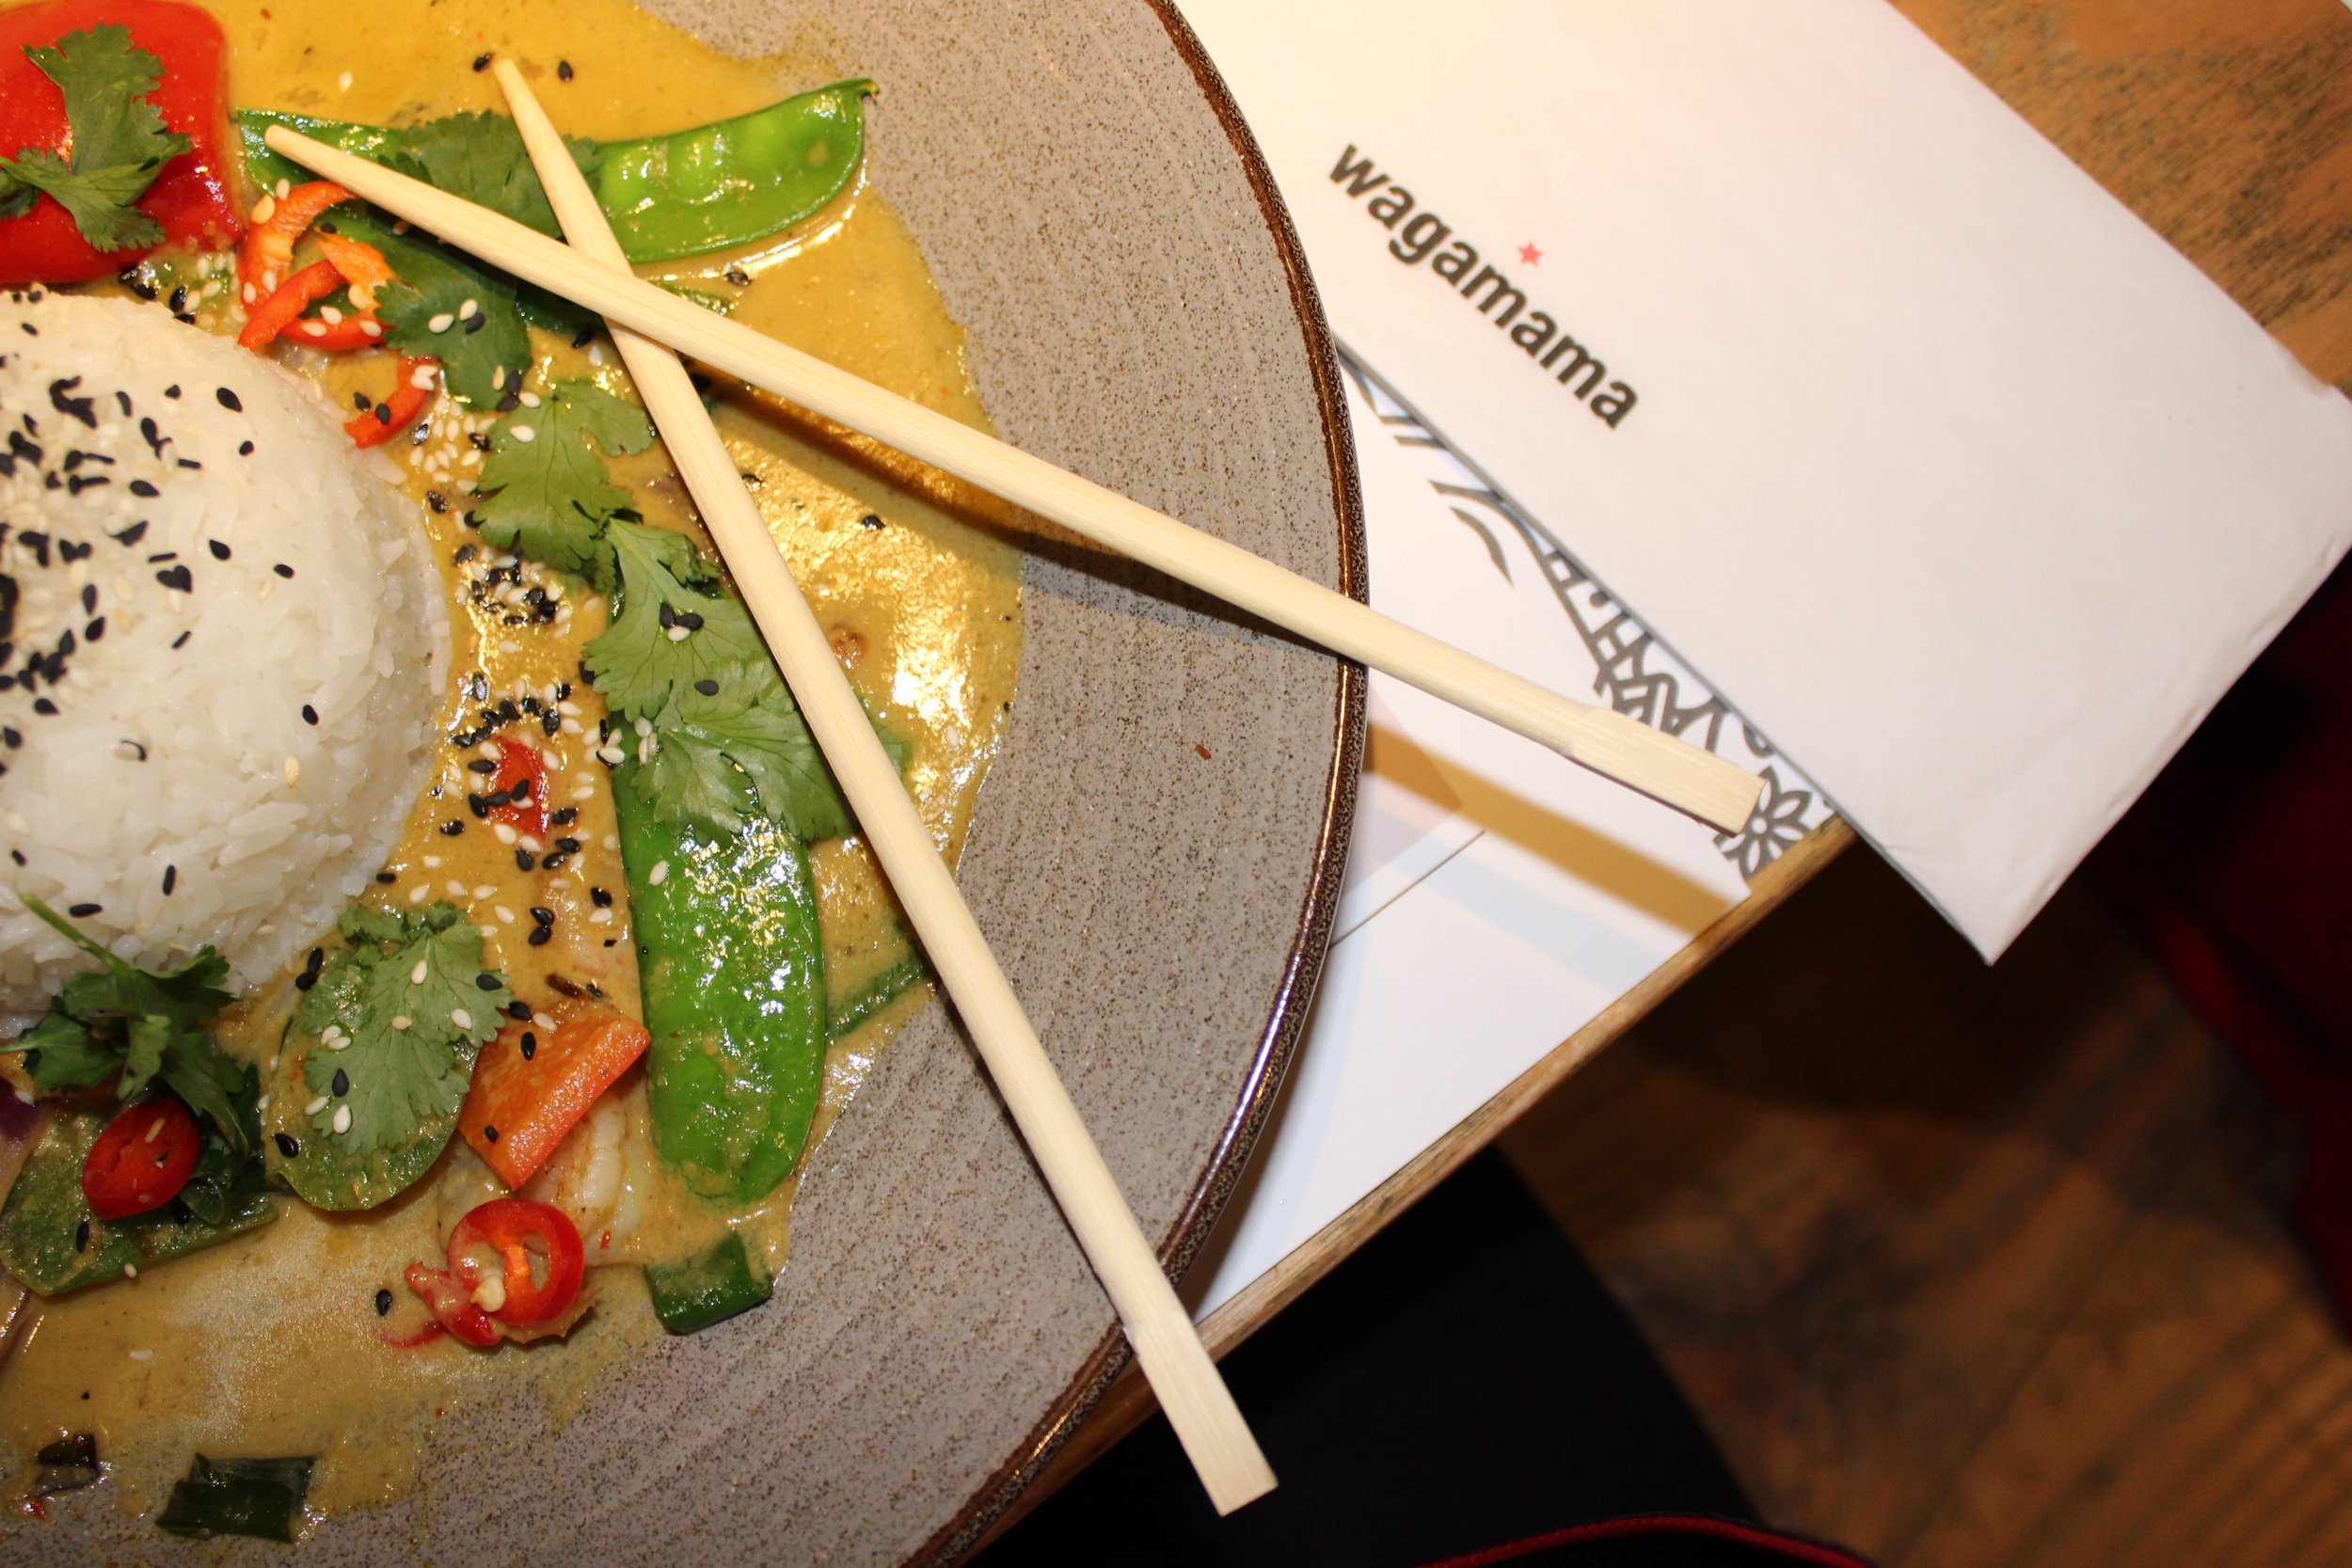 Delicious Wagamama Raisukaree Curry